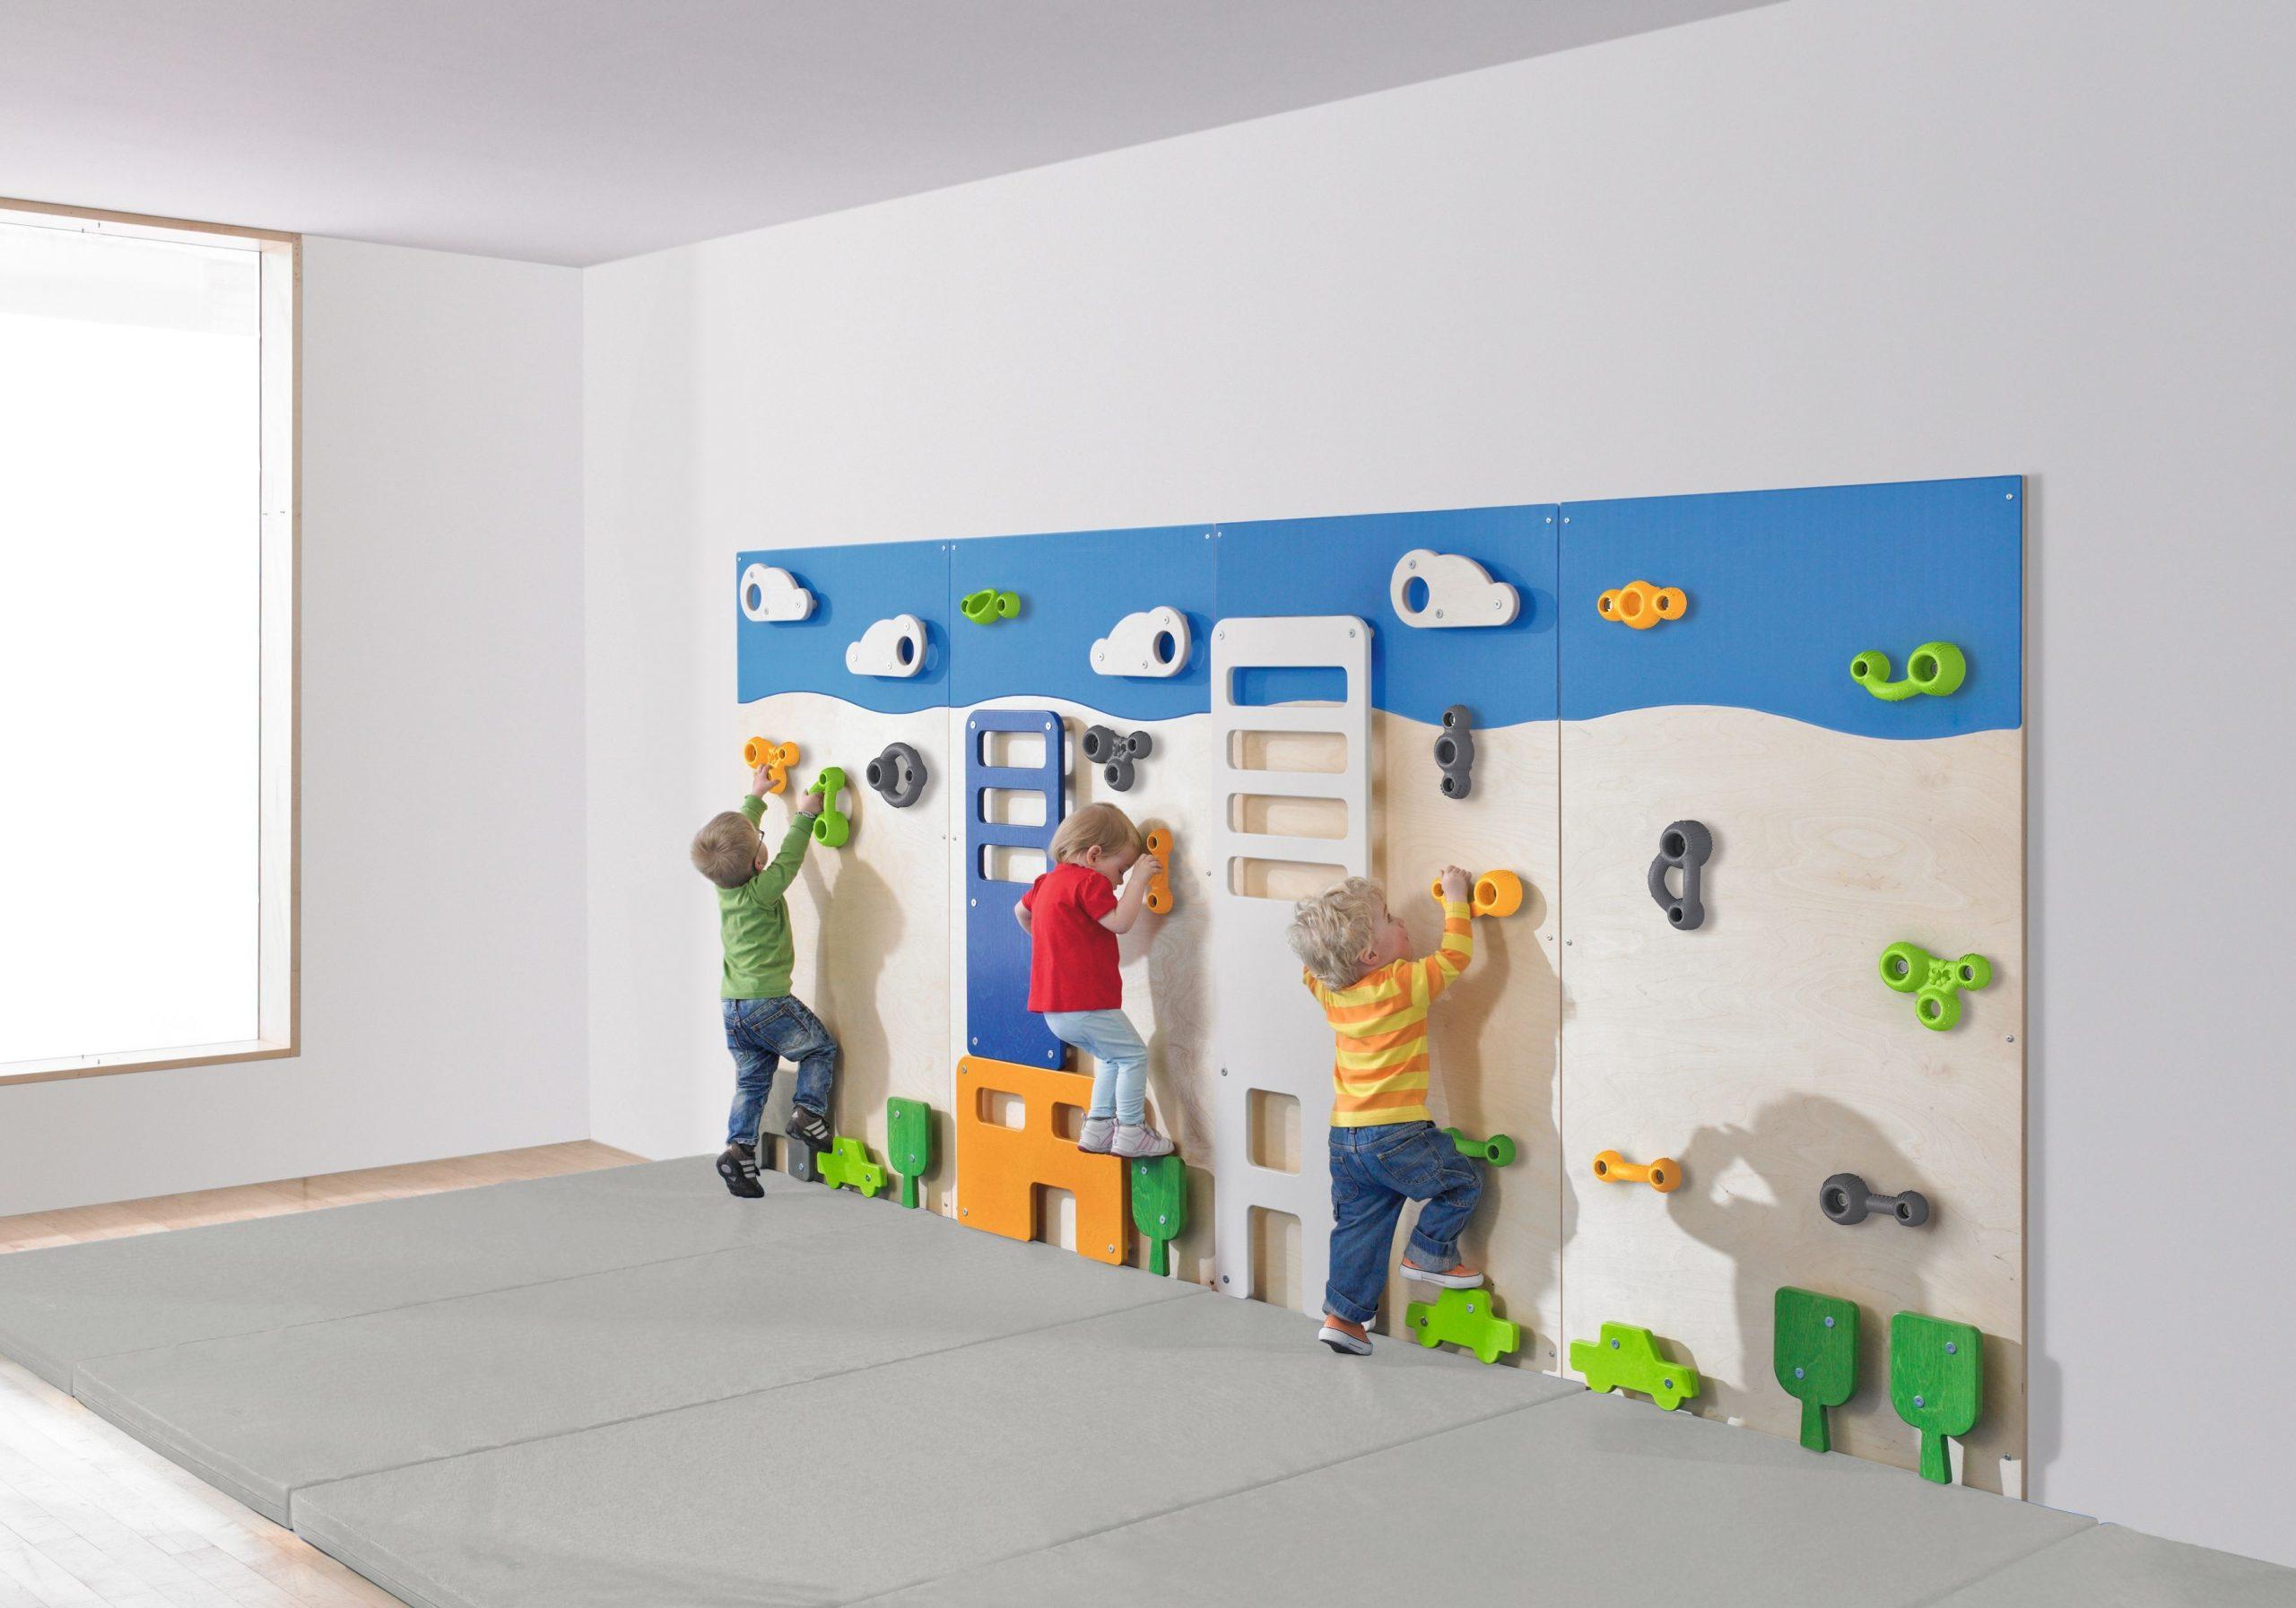 Mur D'escalade Spécial Crèche | Mur Escalade, Petite Enfance ... avec Mur D Escalade Pour Jardin